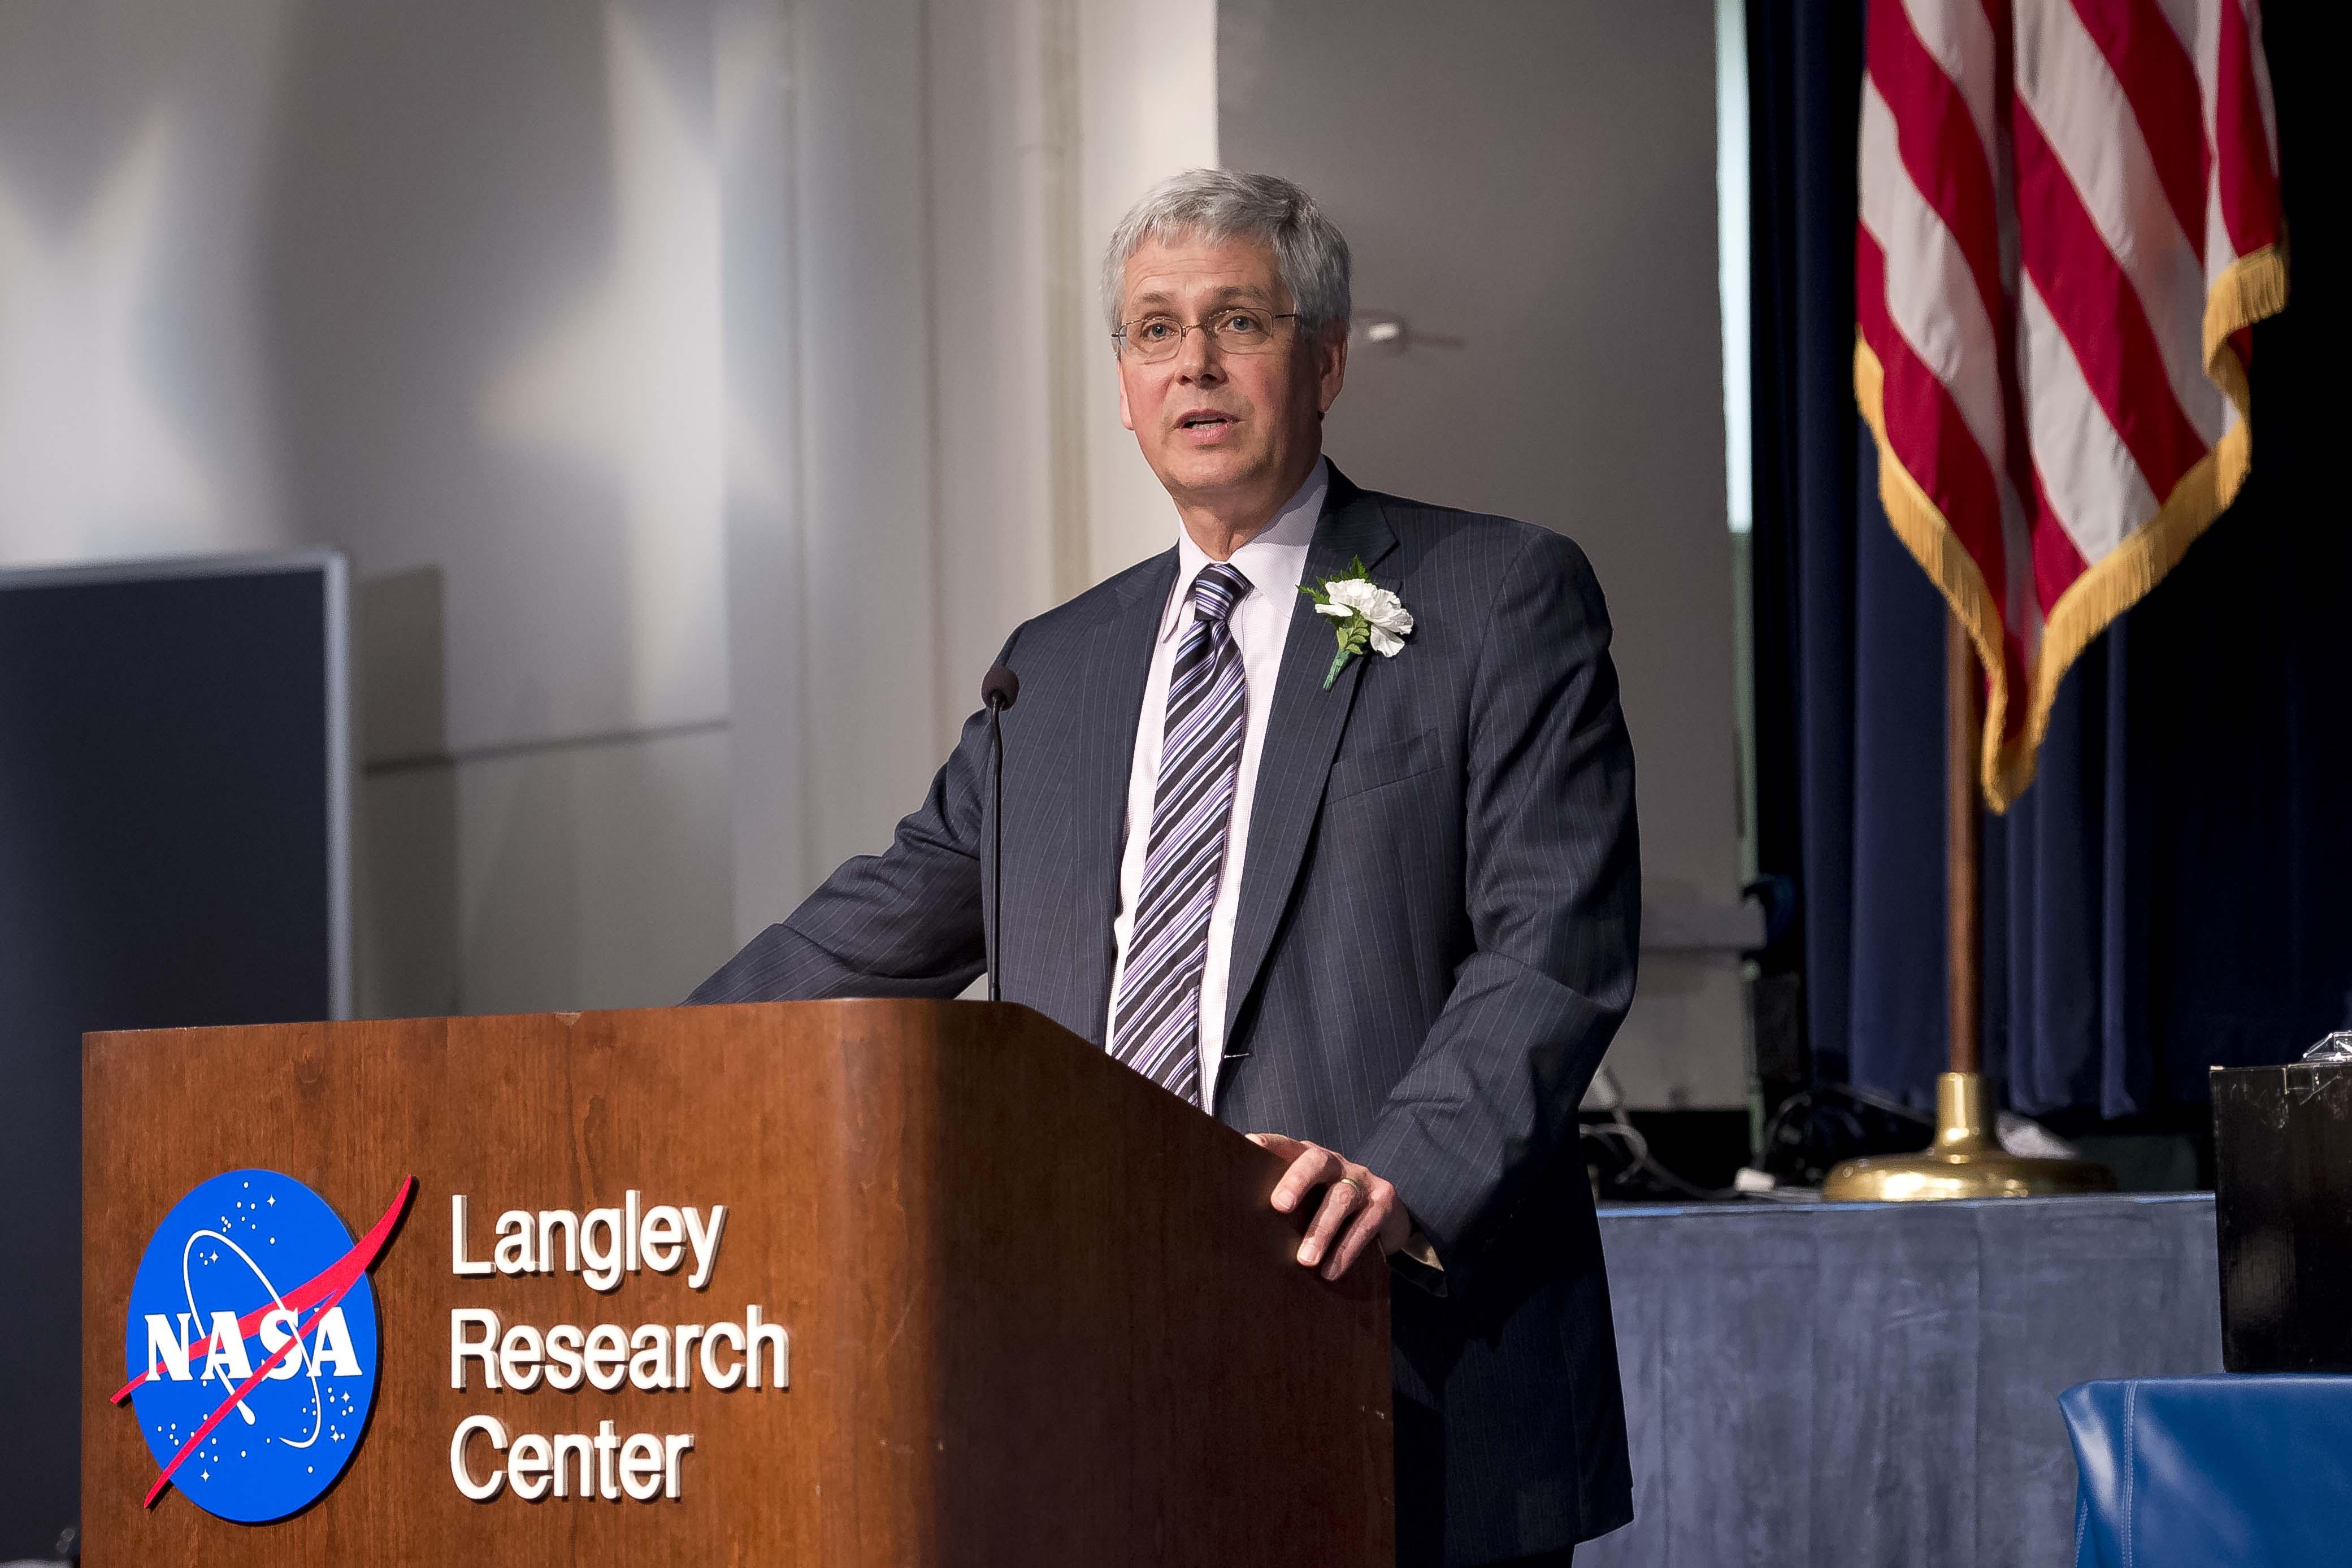 2013 Honor Awards Speak To Vitality Of Center NASA